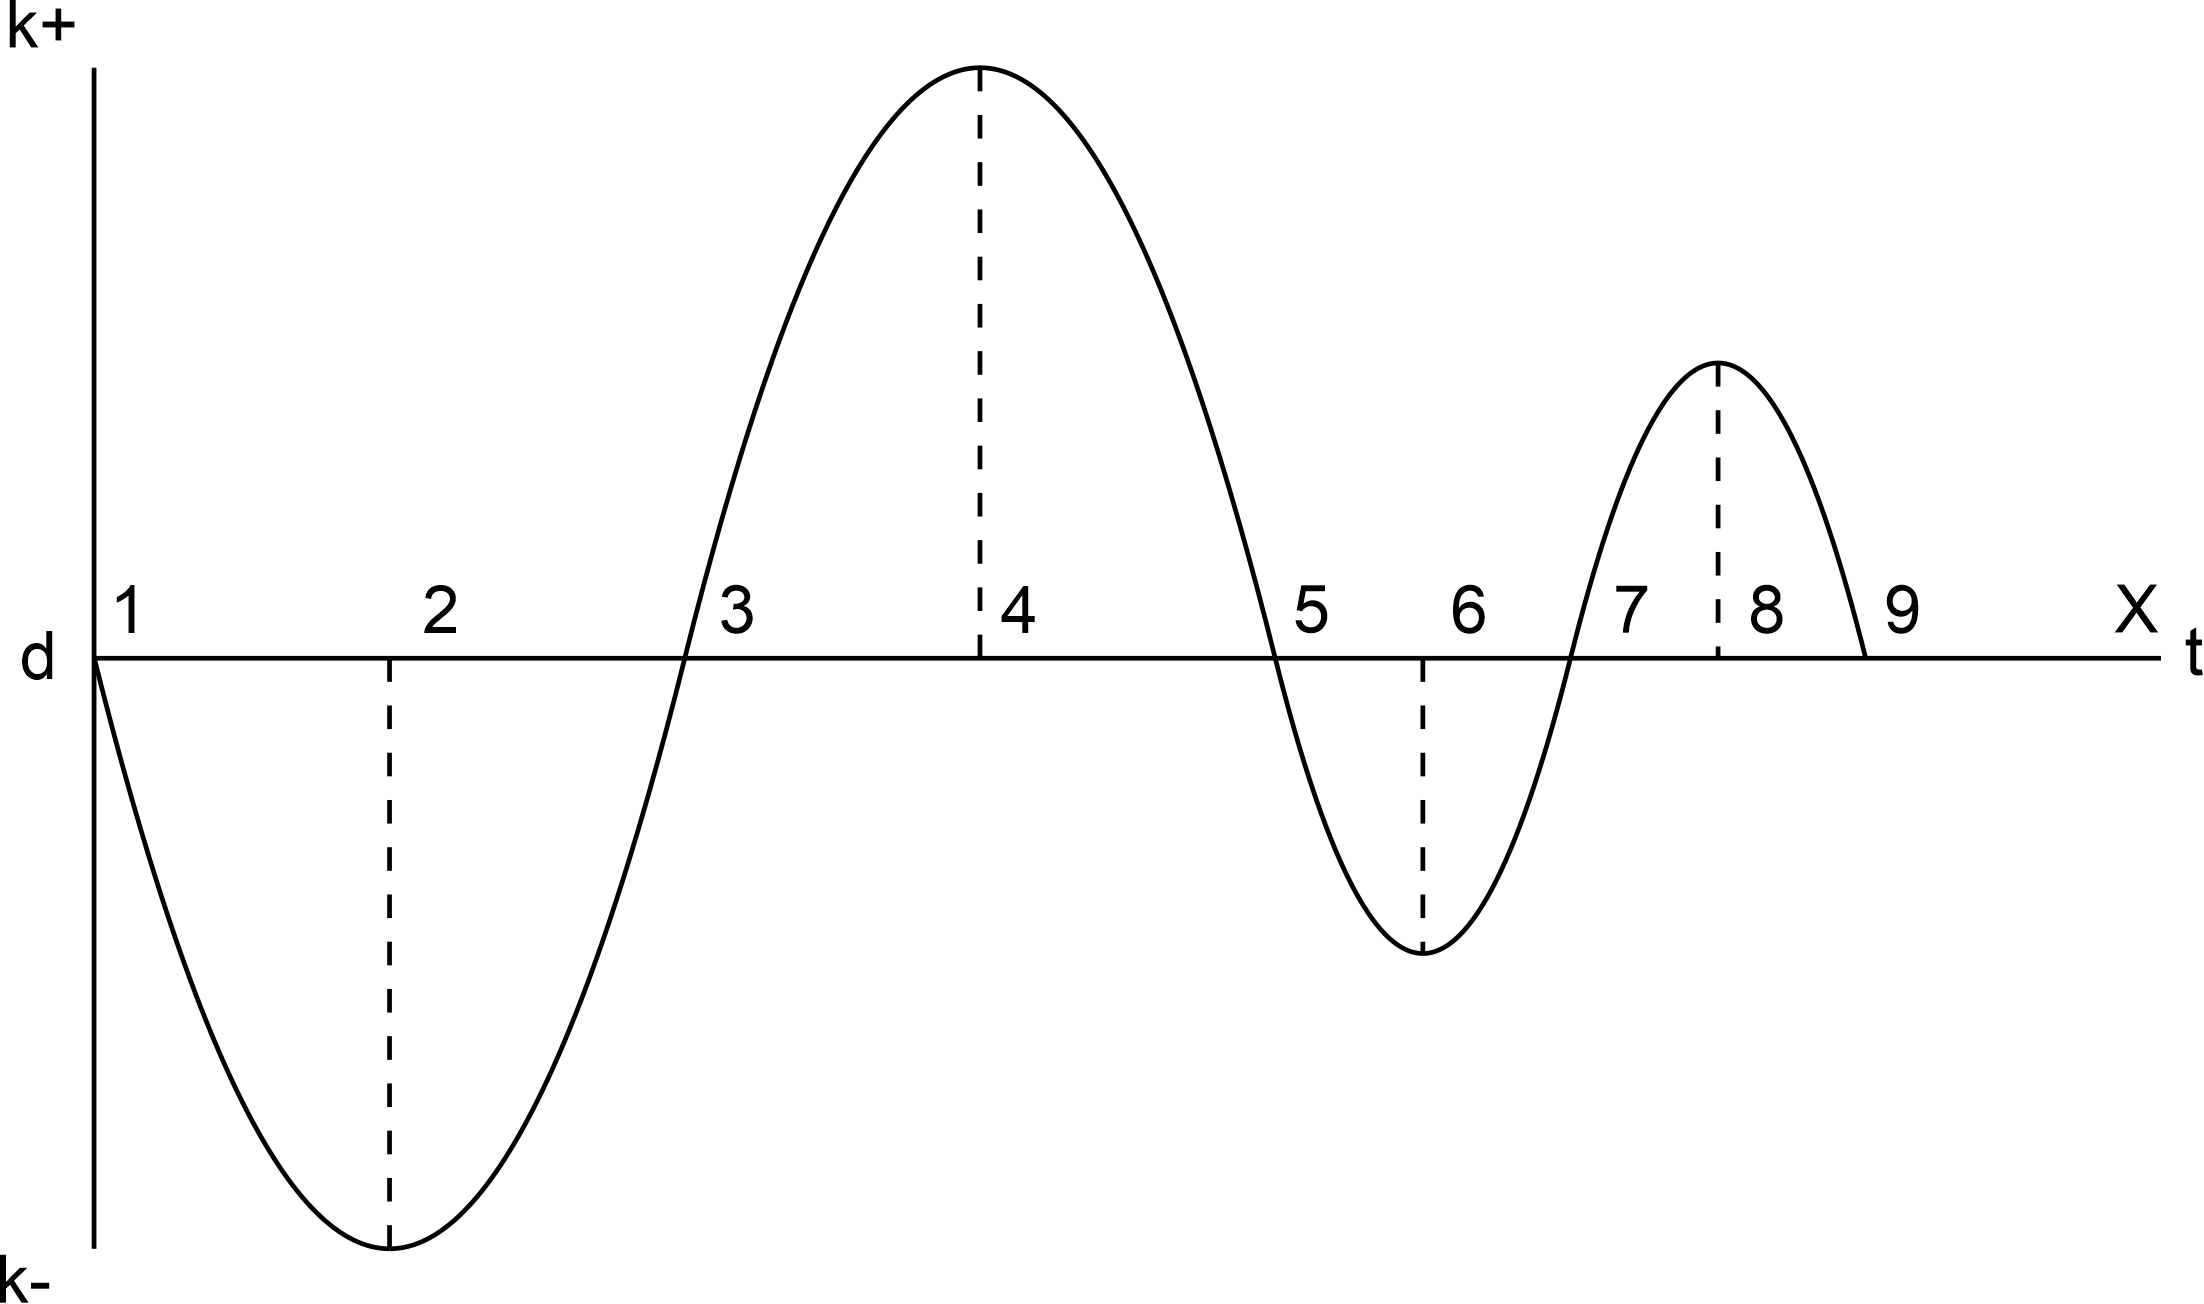 The Karmic Spiral 1